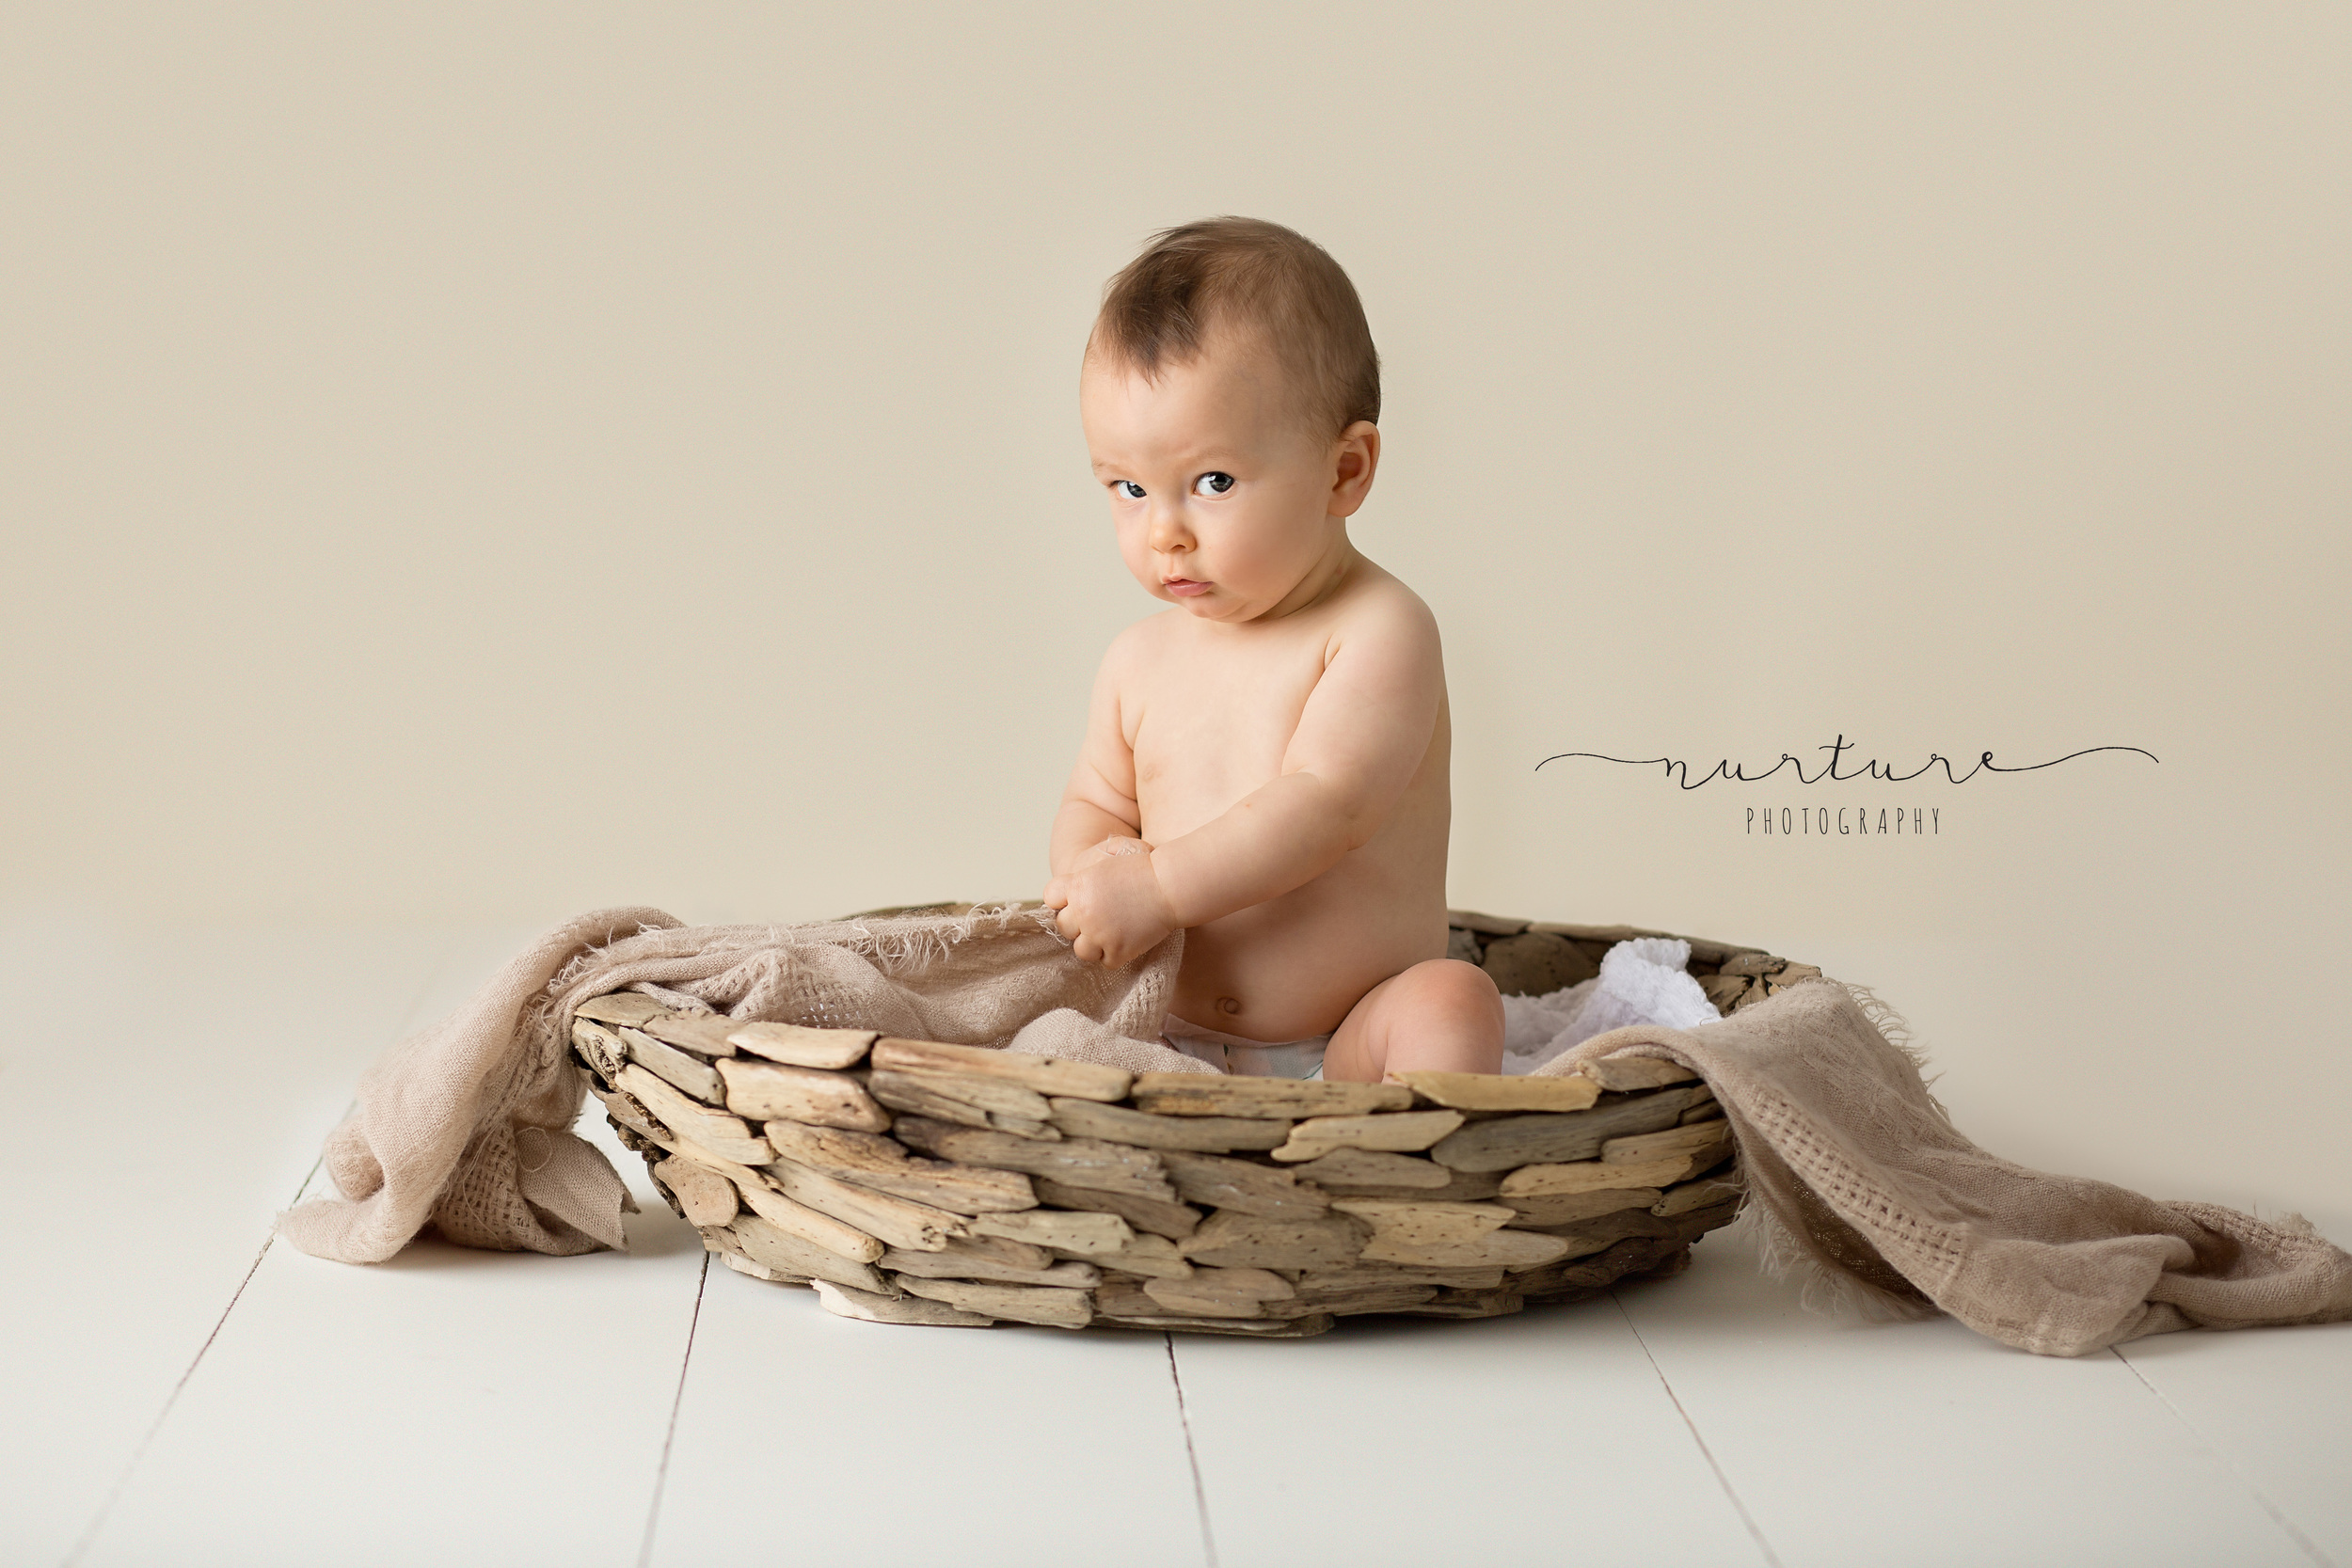 torrance-redondobeach-hermosabeach-manhattanbeach-palosverdes-southbay-photographer-newborn-baby-newbornphotographer-nurturephotography-babyphotographer-newbornphotographer0584.jpg